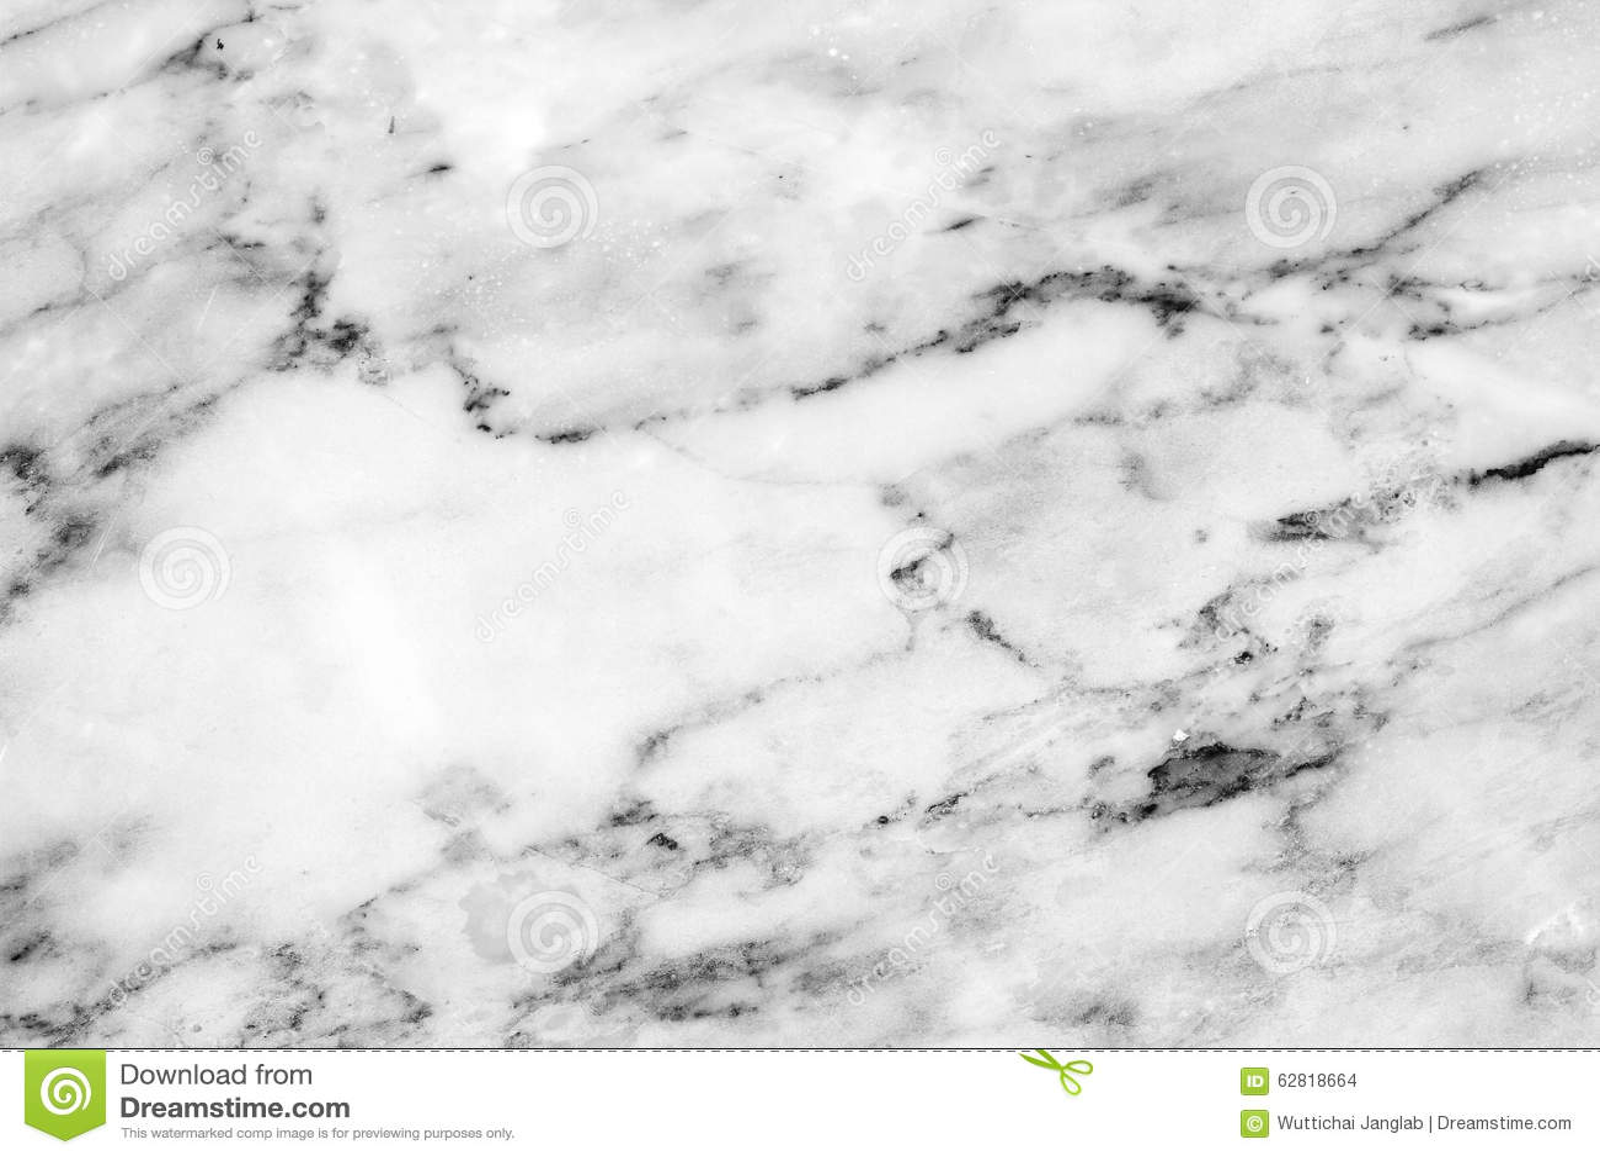 Black And White Marble : Black and white marble pattern background stock photo